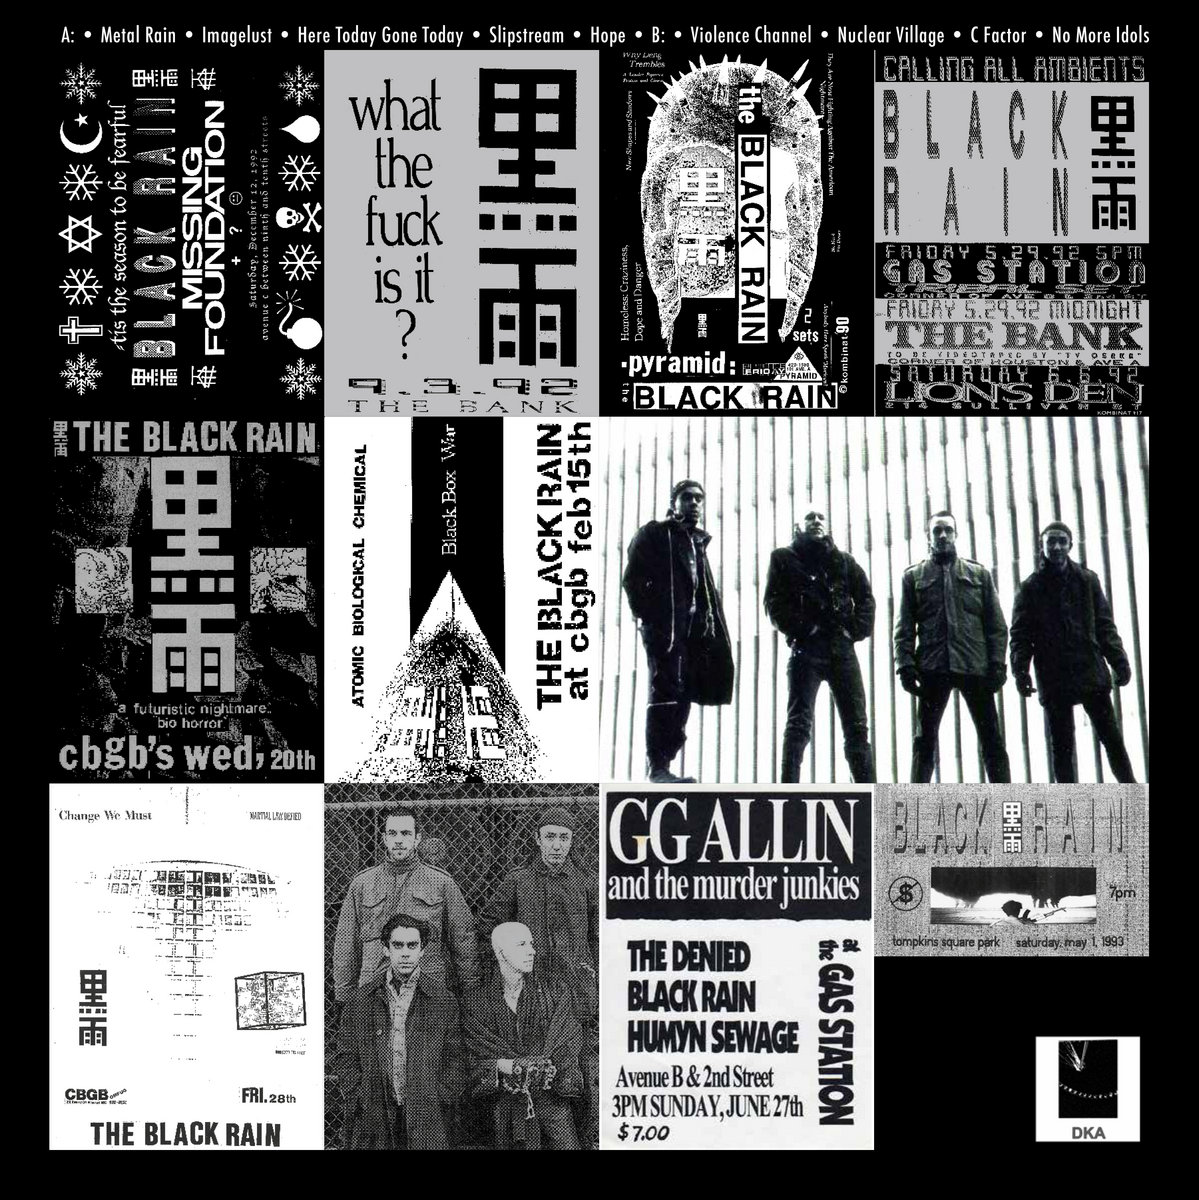 Violence Channel | DKA Records